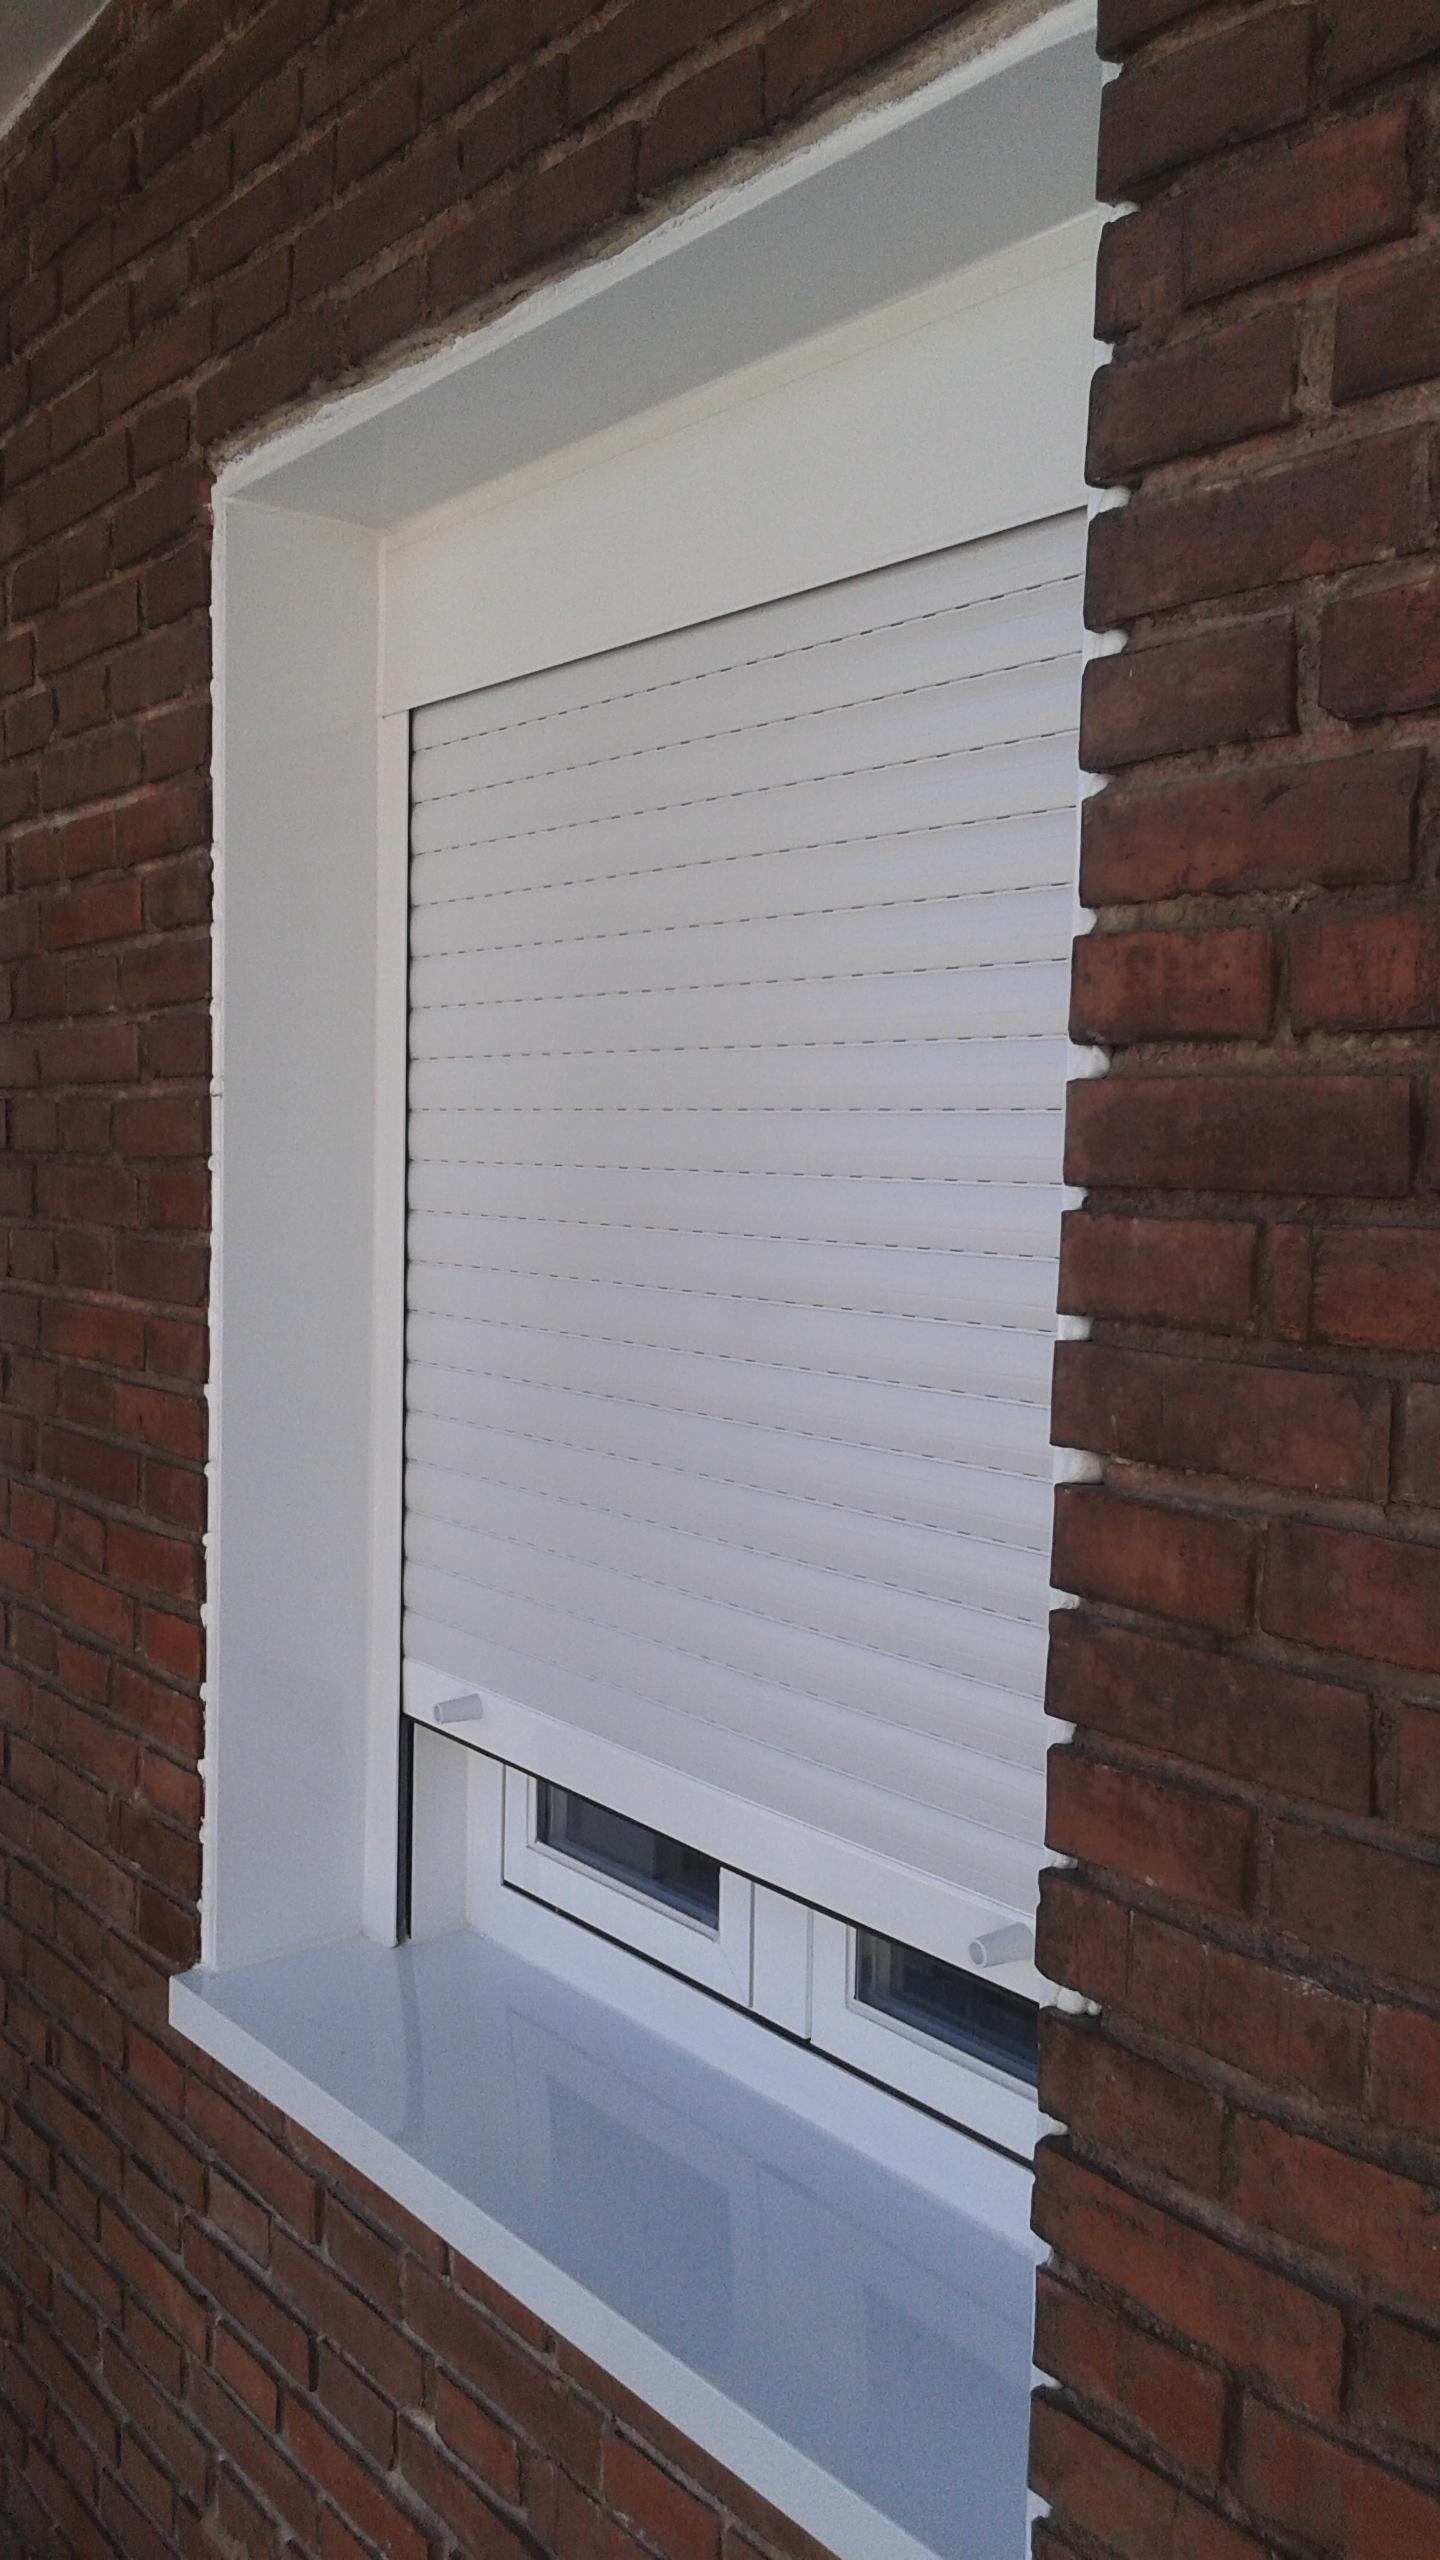 Galeria ancar aluminio pvc for Ventanas aluminio color titanio